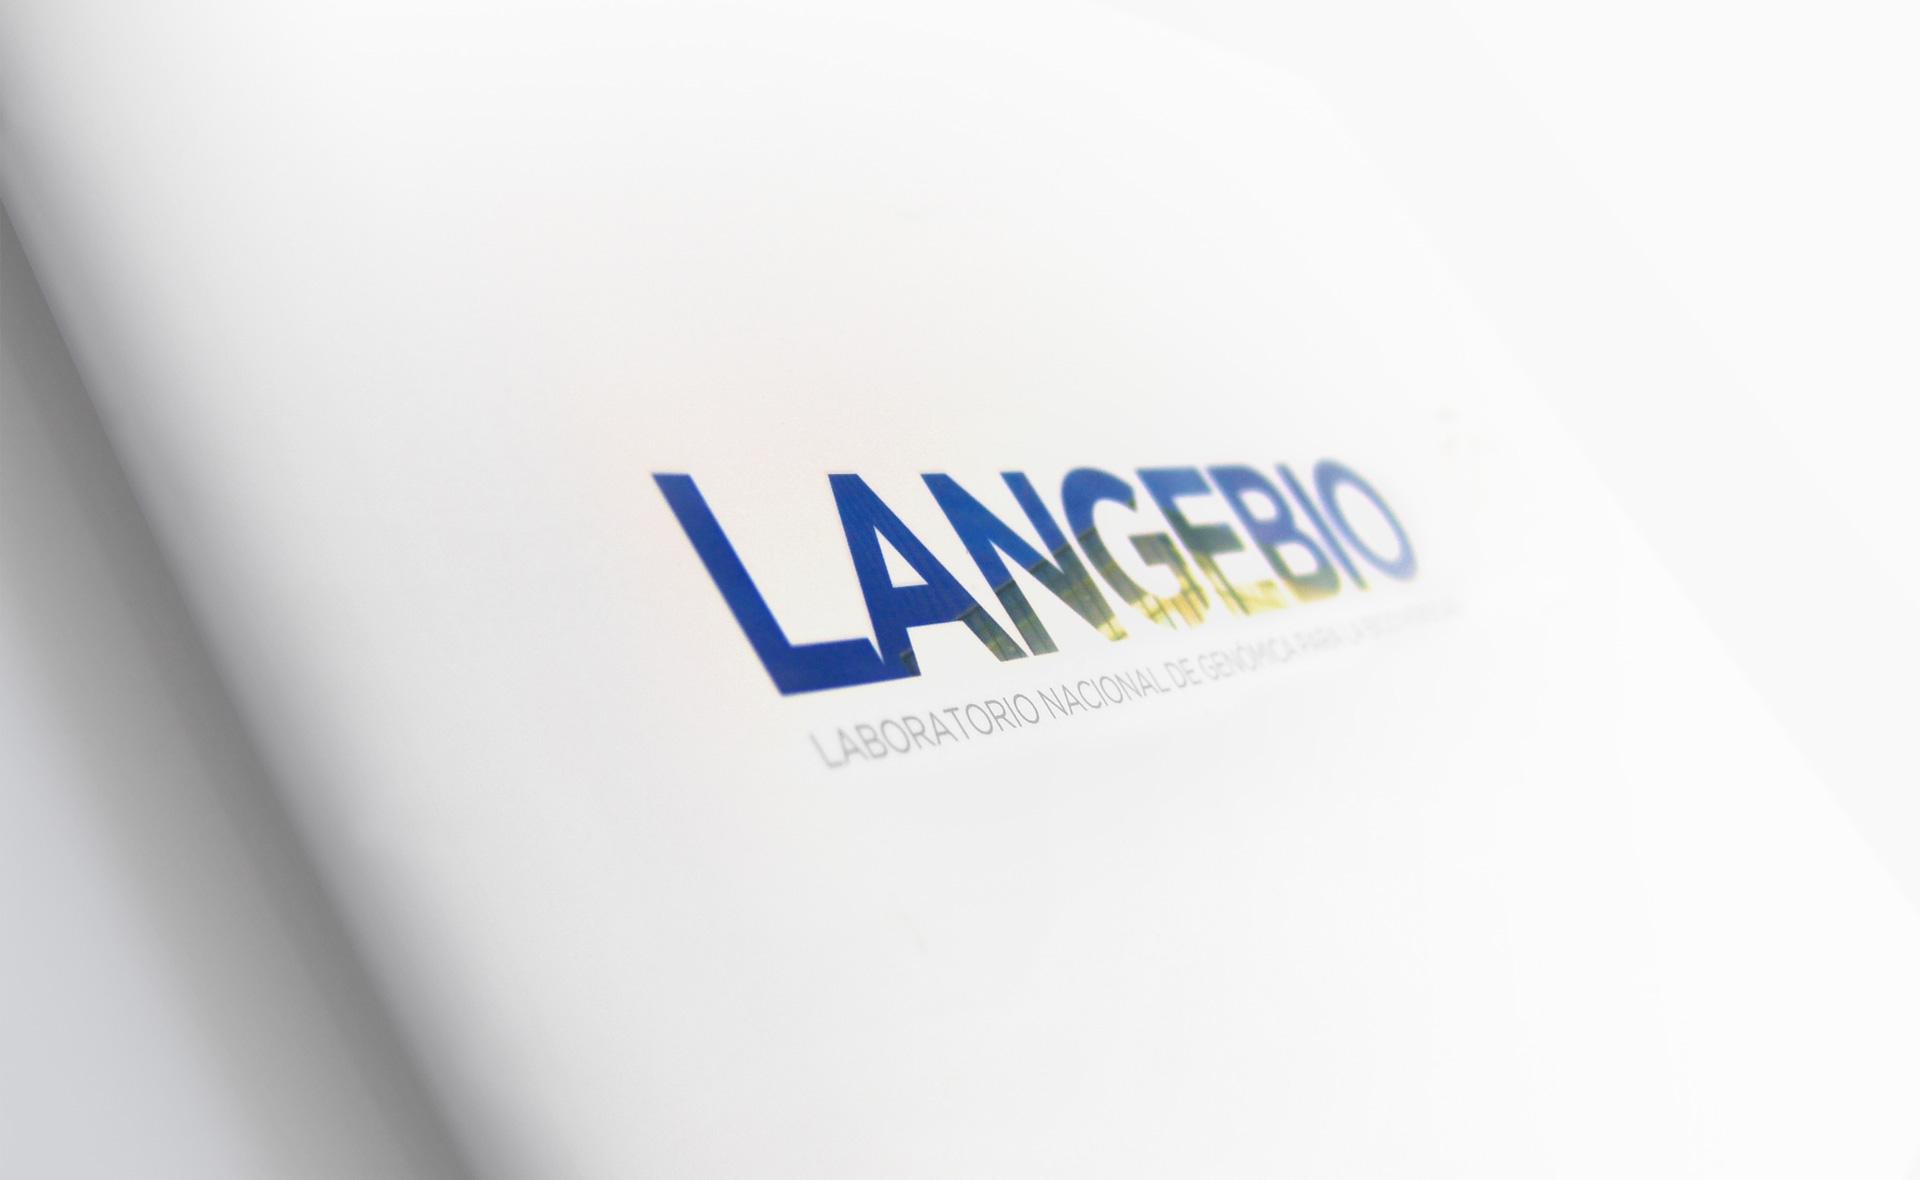 Lab Langebio